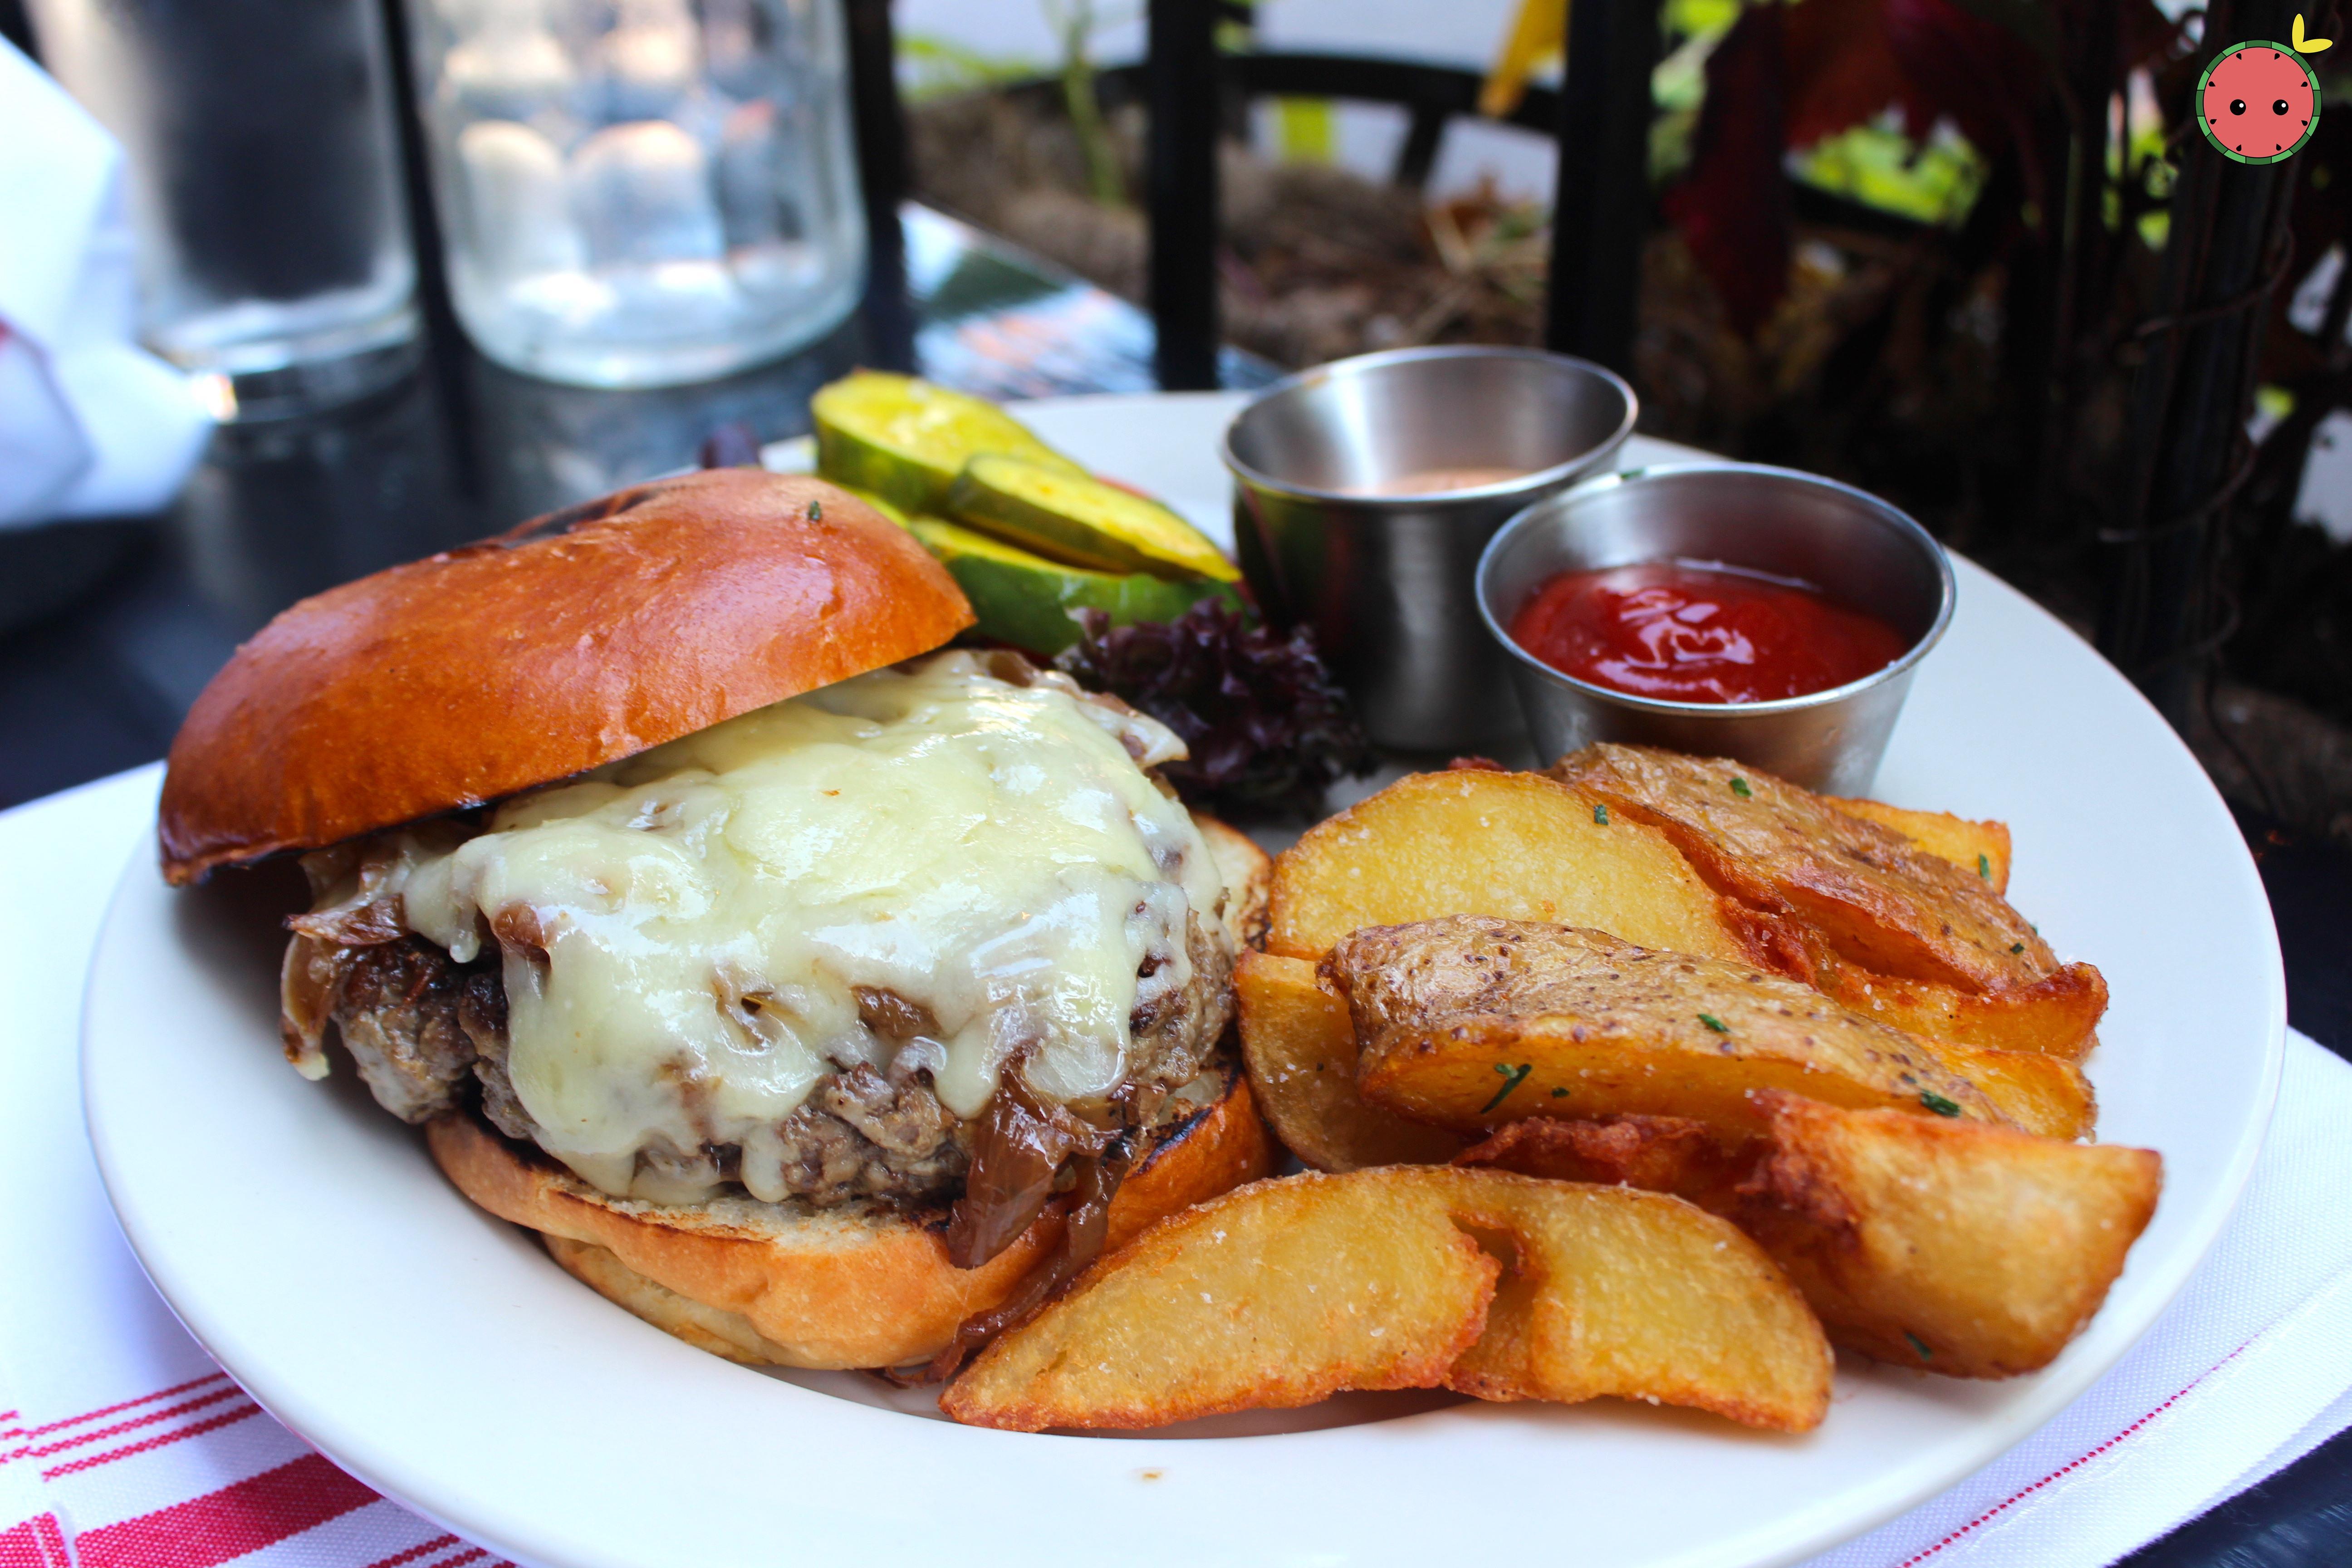 Bone marrow & brisket burger with tarentaise cheese, carmelized onions, crispy potato wedges